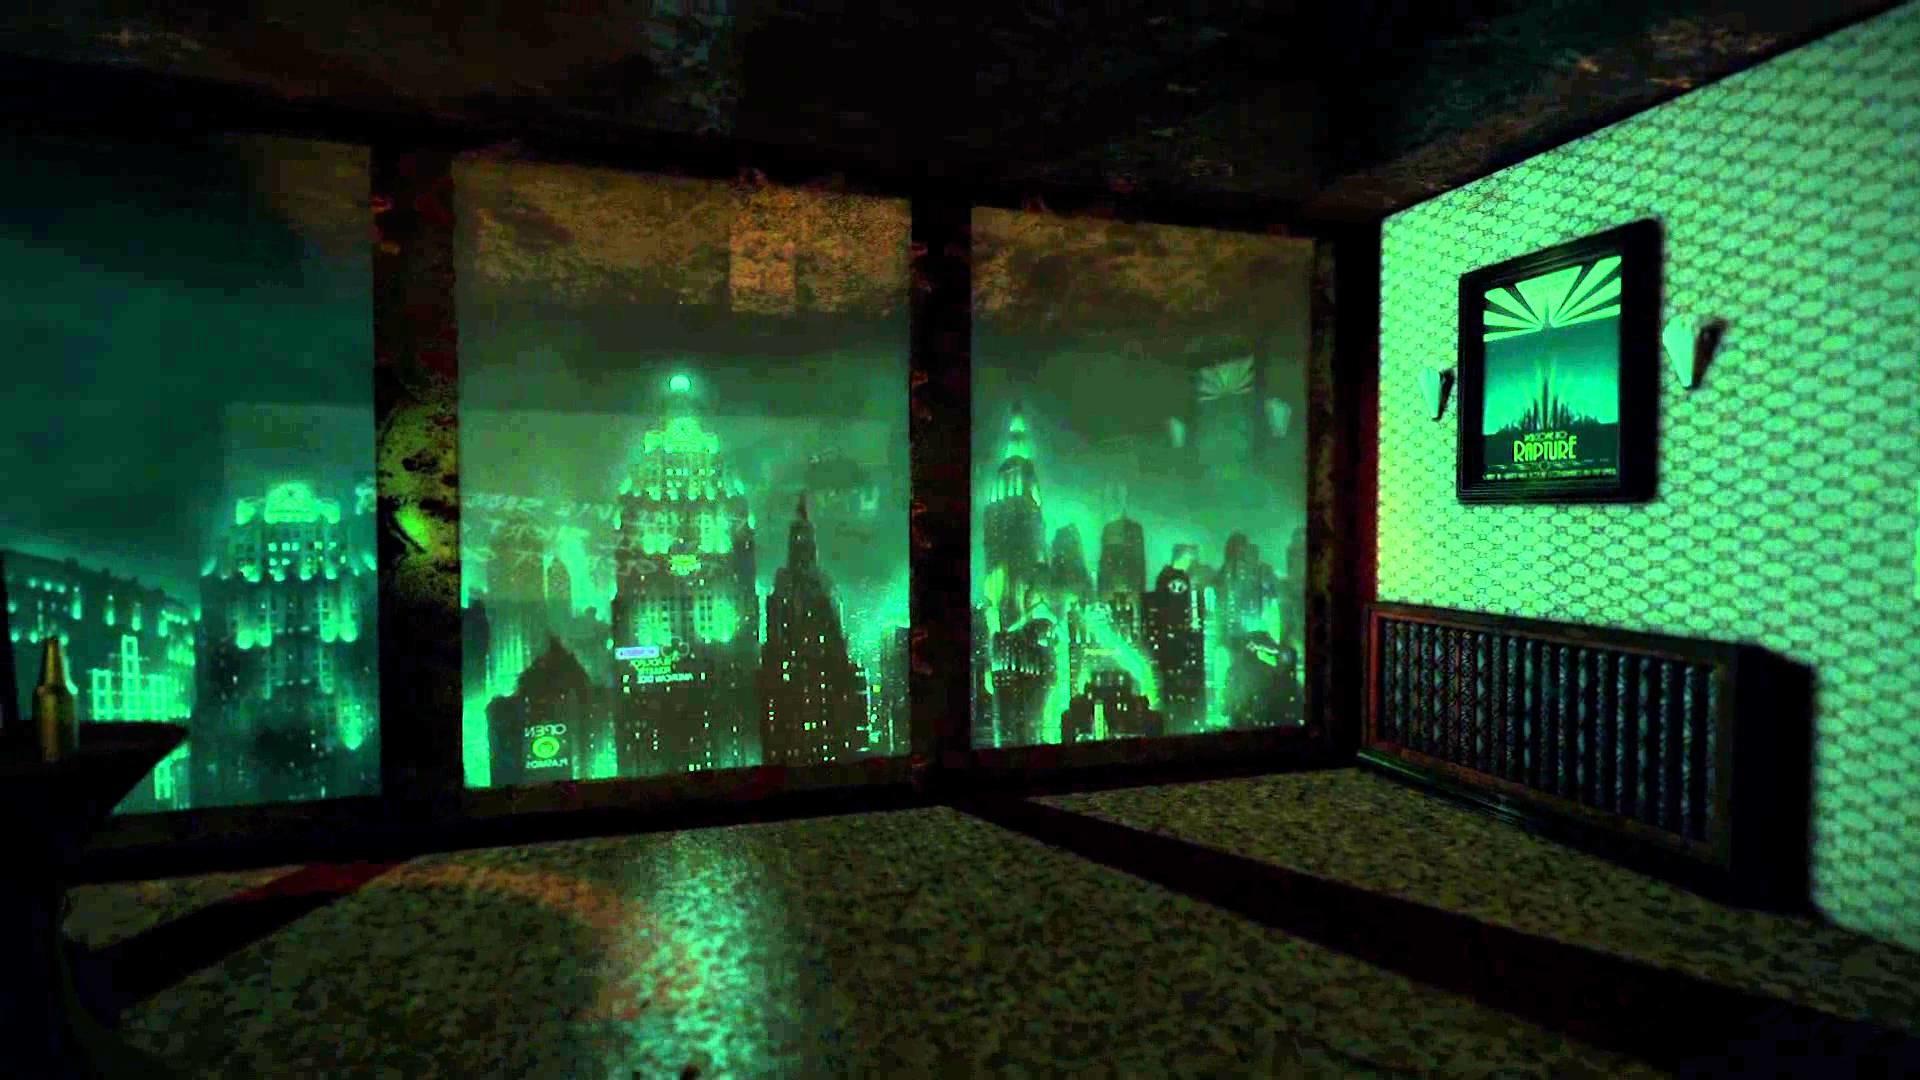 Supreme Wallpaper Iphone X Bioshock Rapture Wallpaper 84 Images